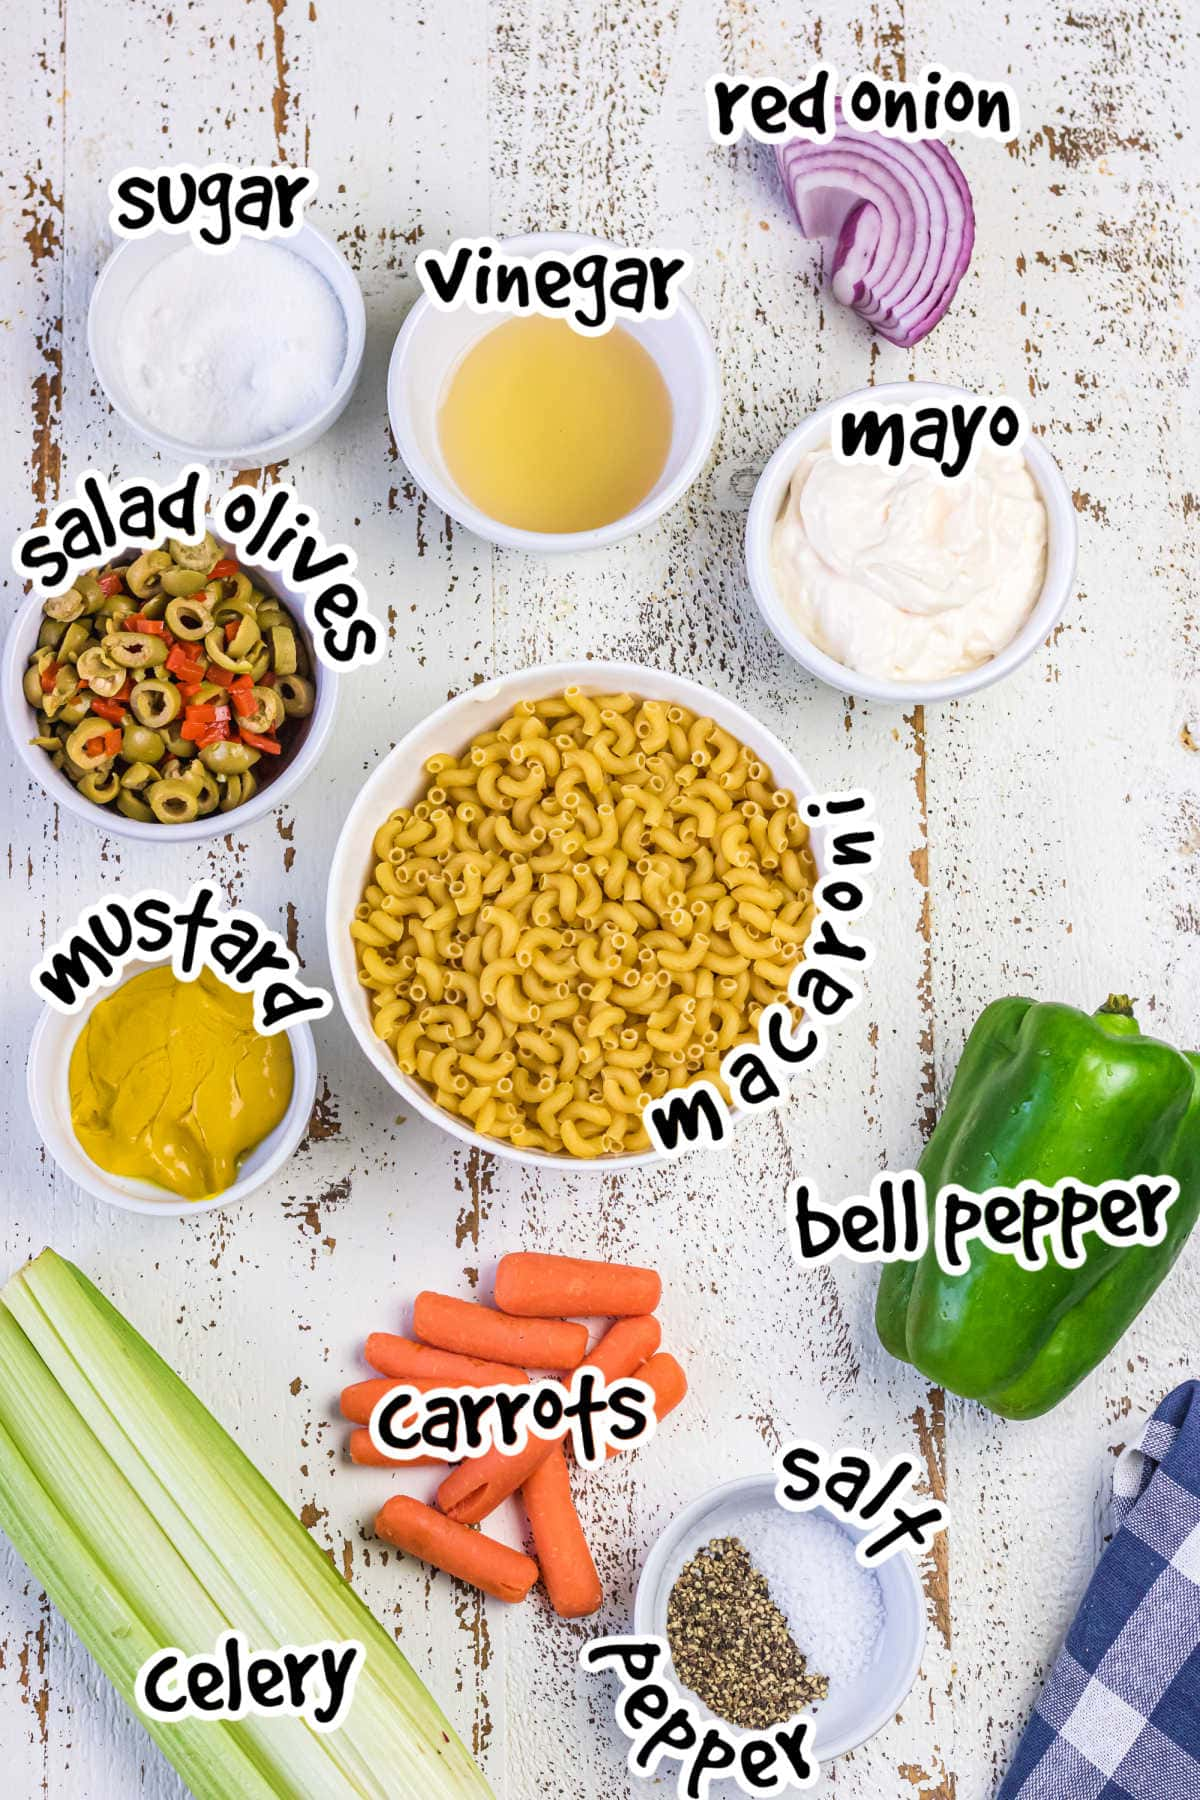 Labeled ingredients for macaroni salad.